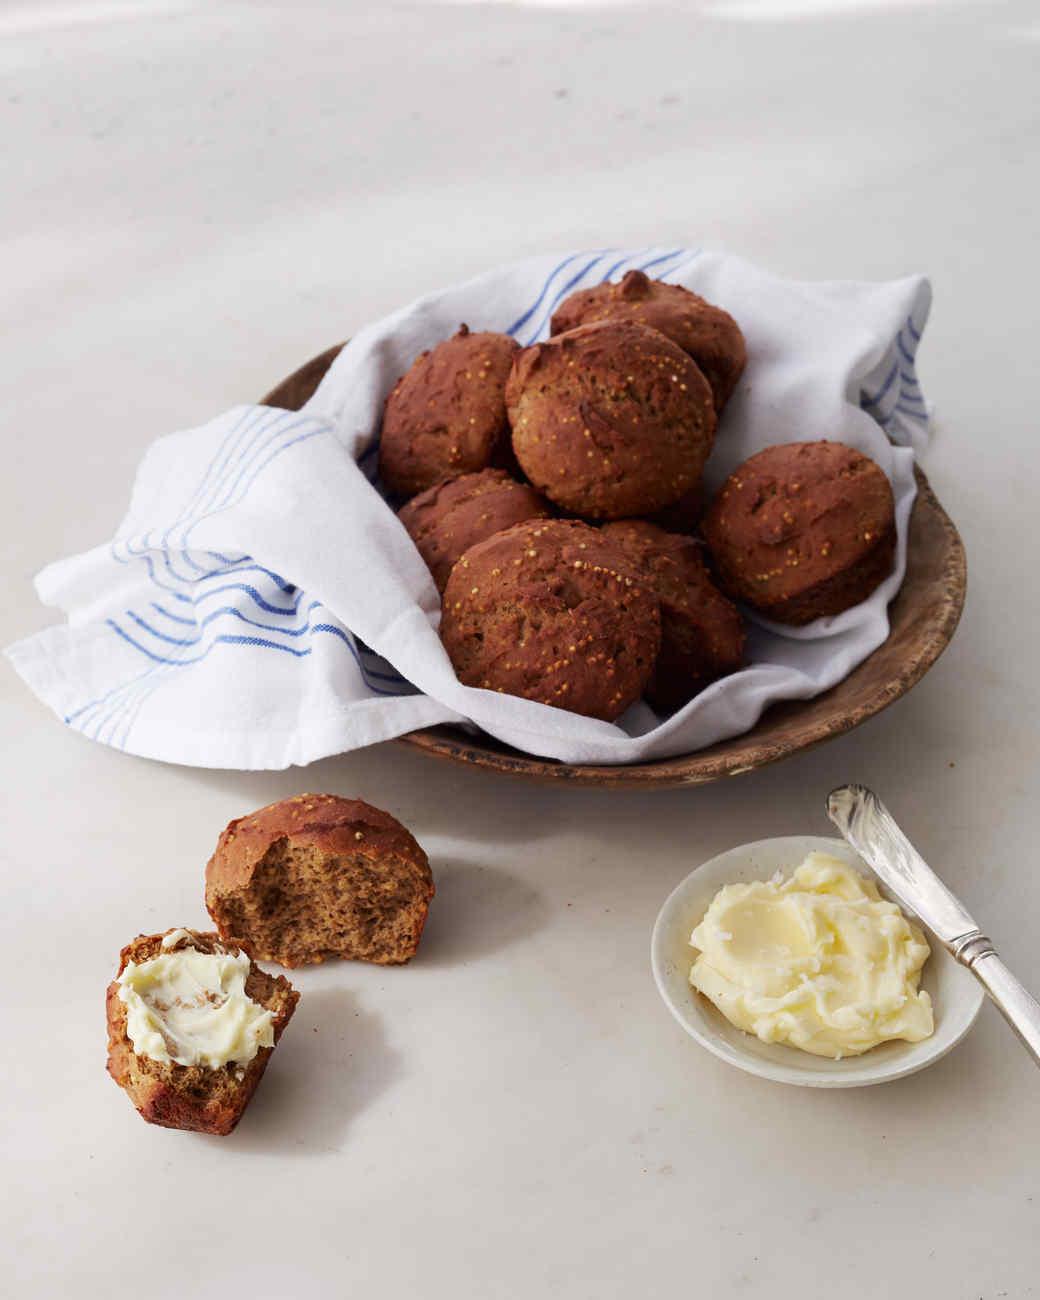 gluten-free-dinner-rolls-329-ms-6190441.jpg